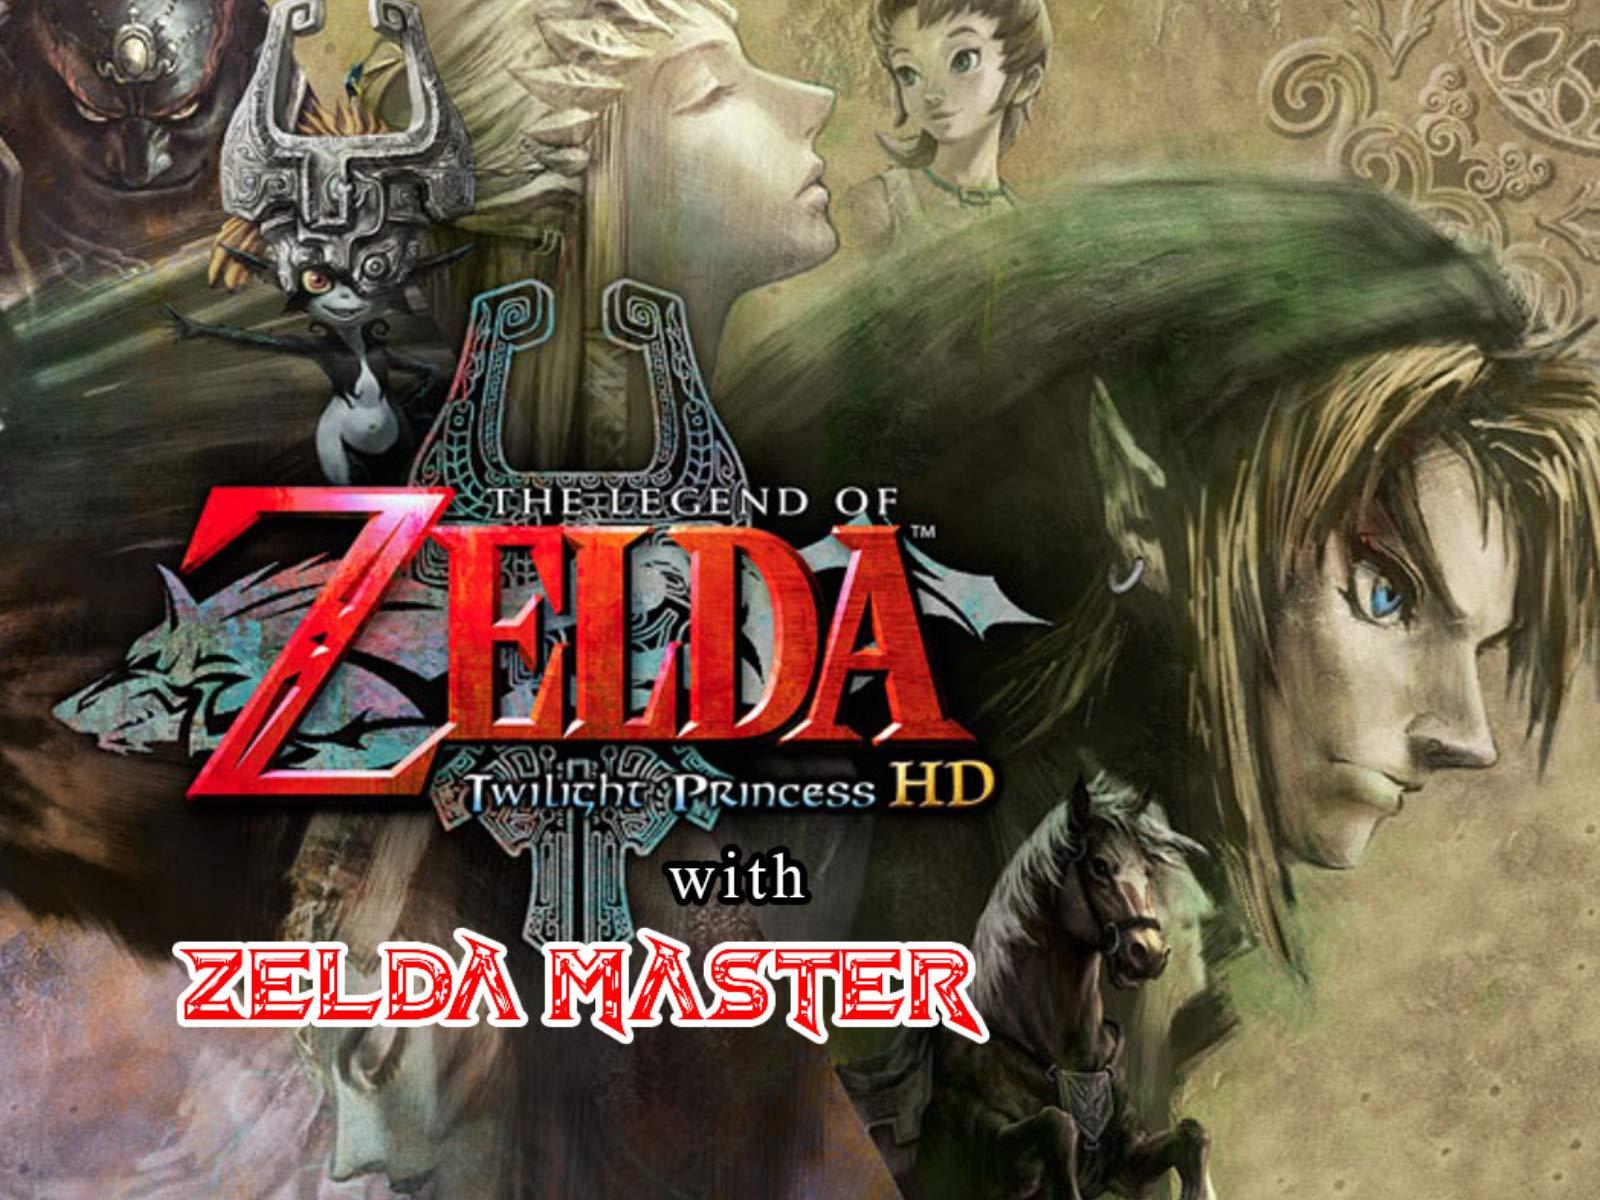 Legend of zelda twilight princess star game part 2 salento igt primitivo